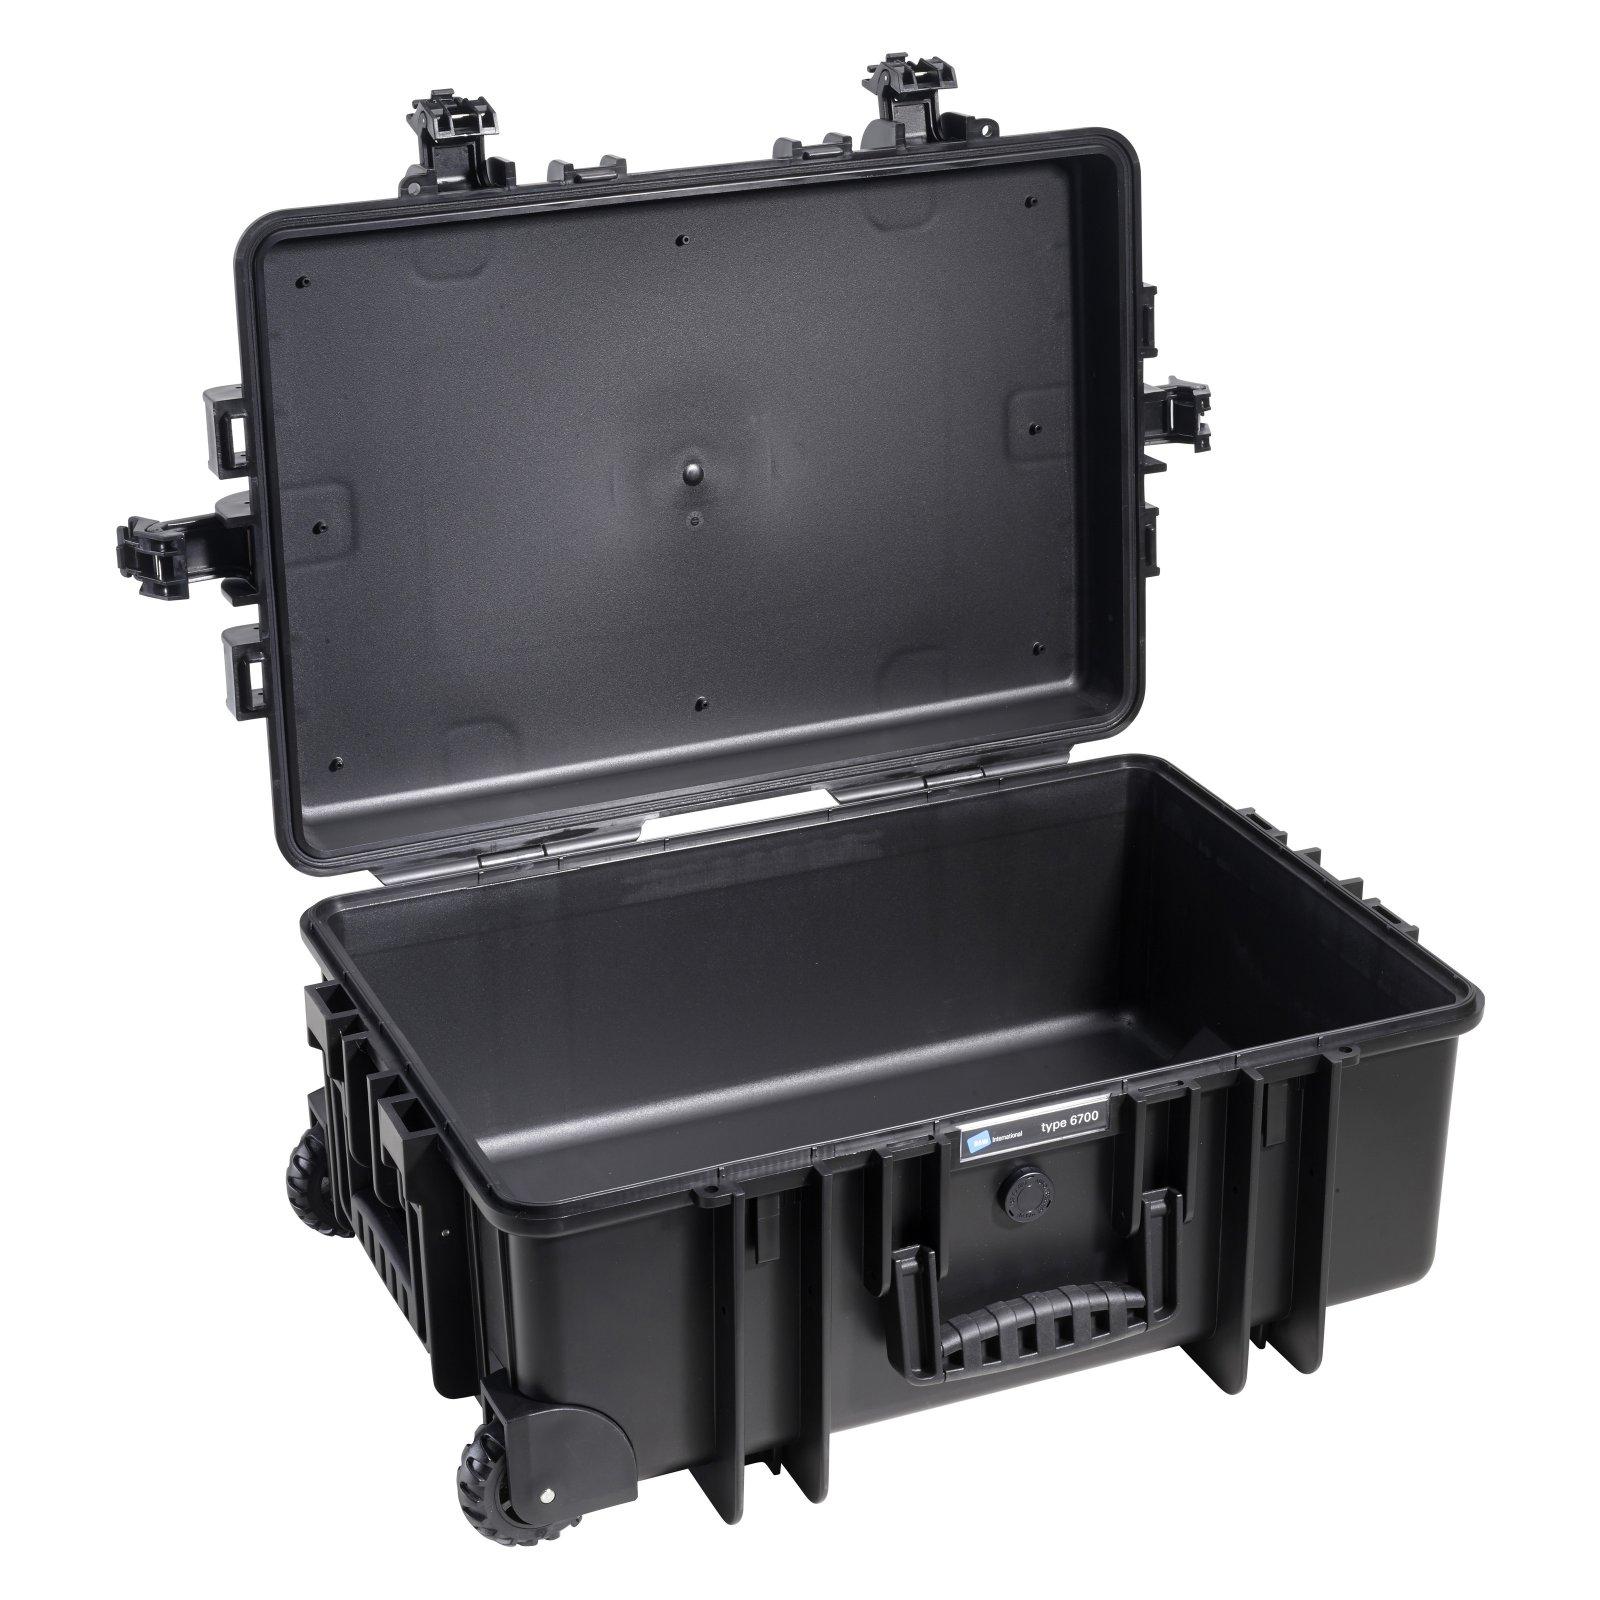 B and W Type 6700 Waterproof Outdoor Storage Case